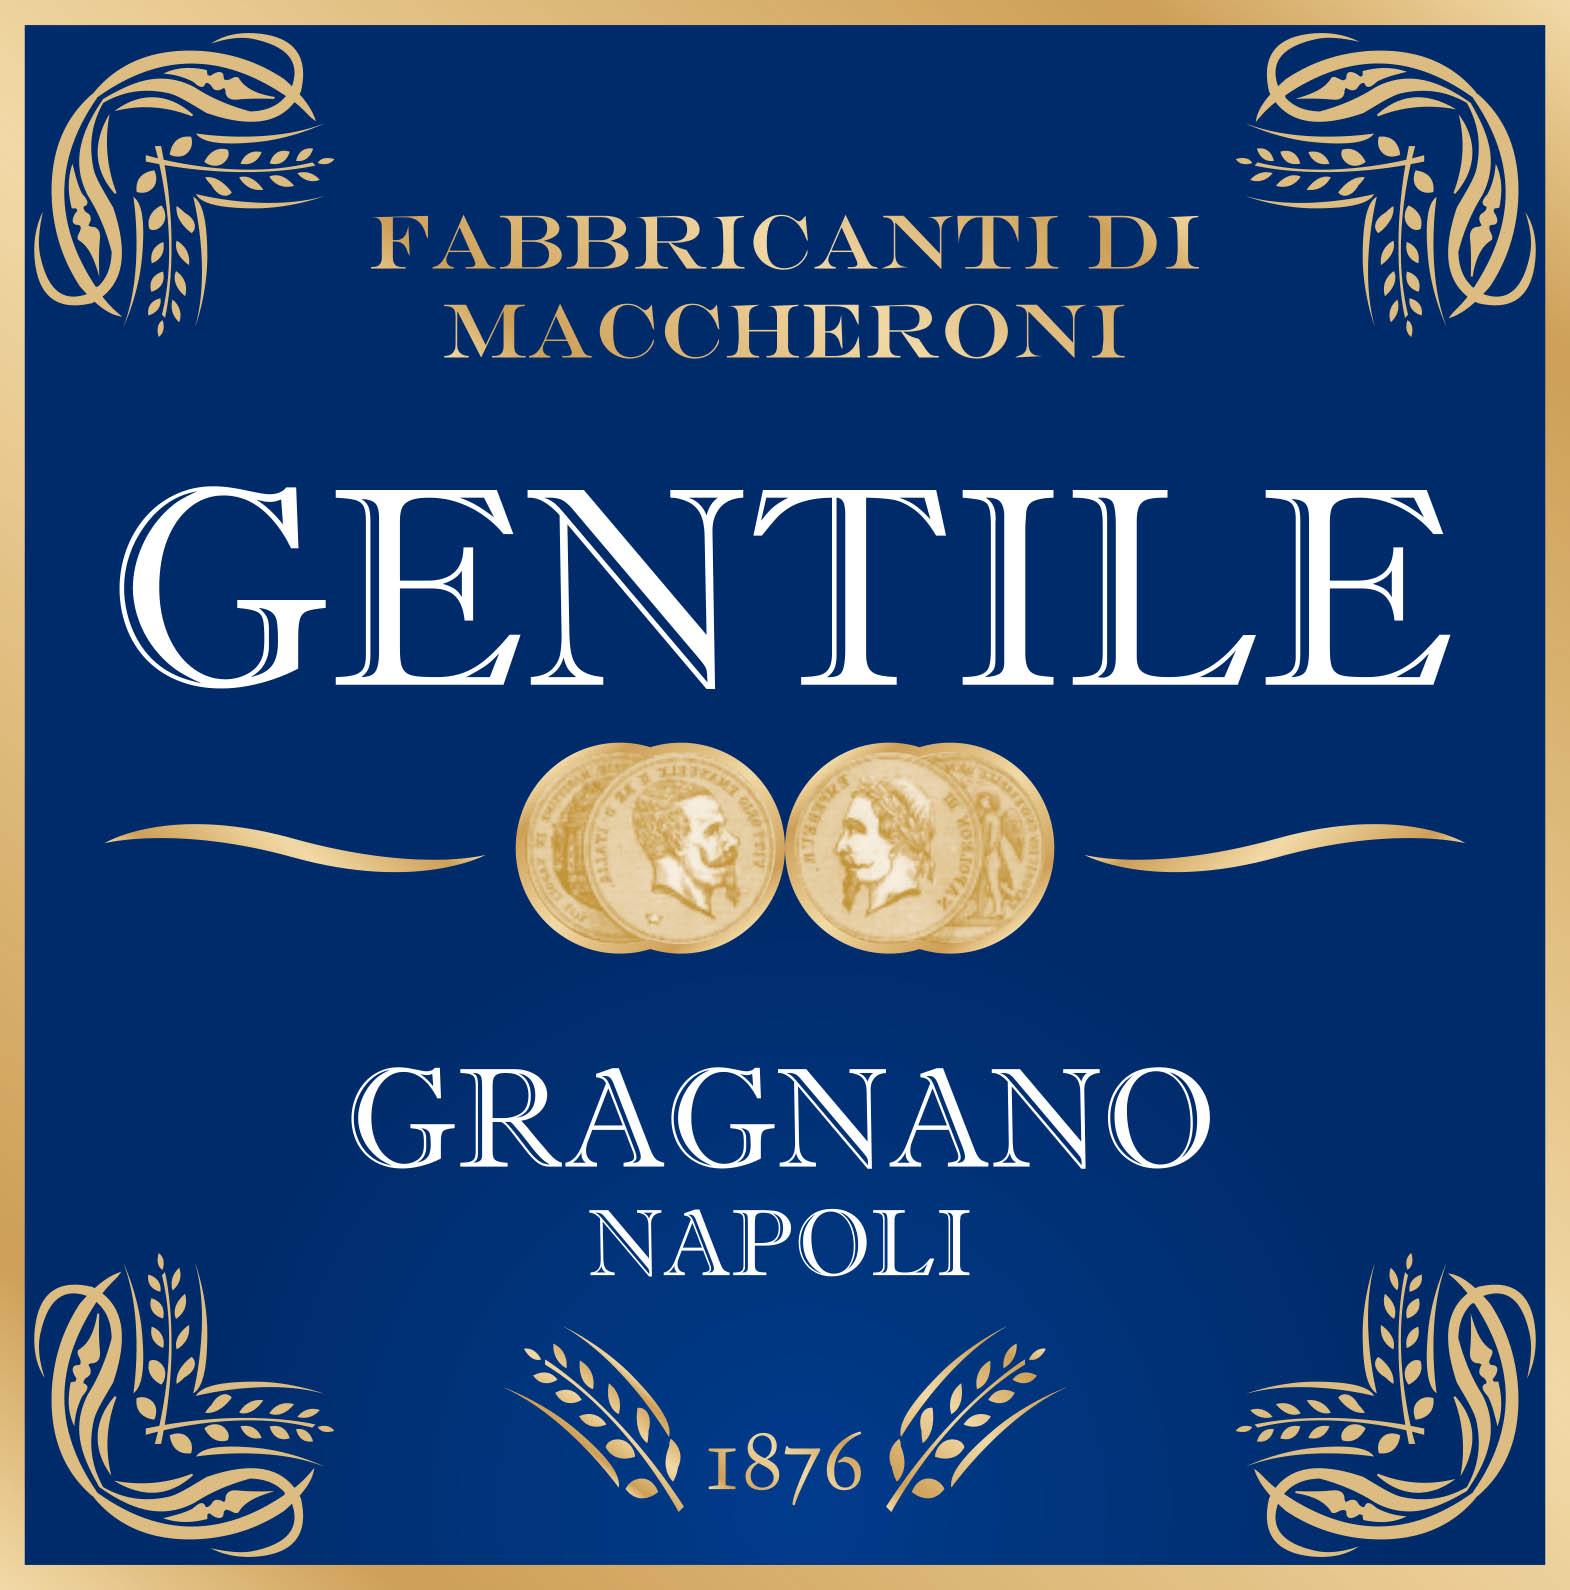 logo Gentile SUPERHD.jpg